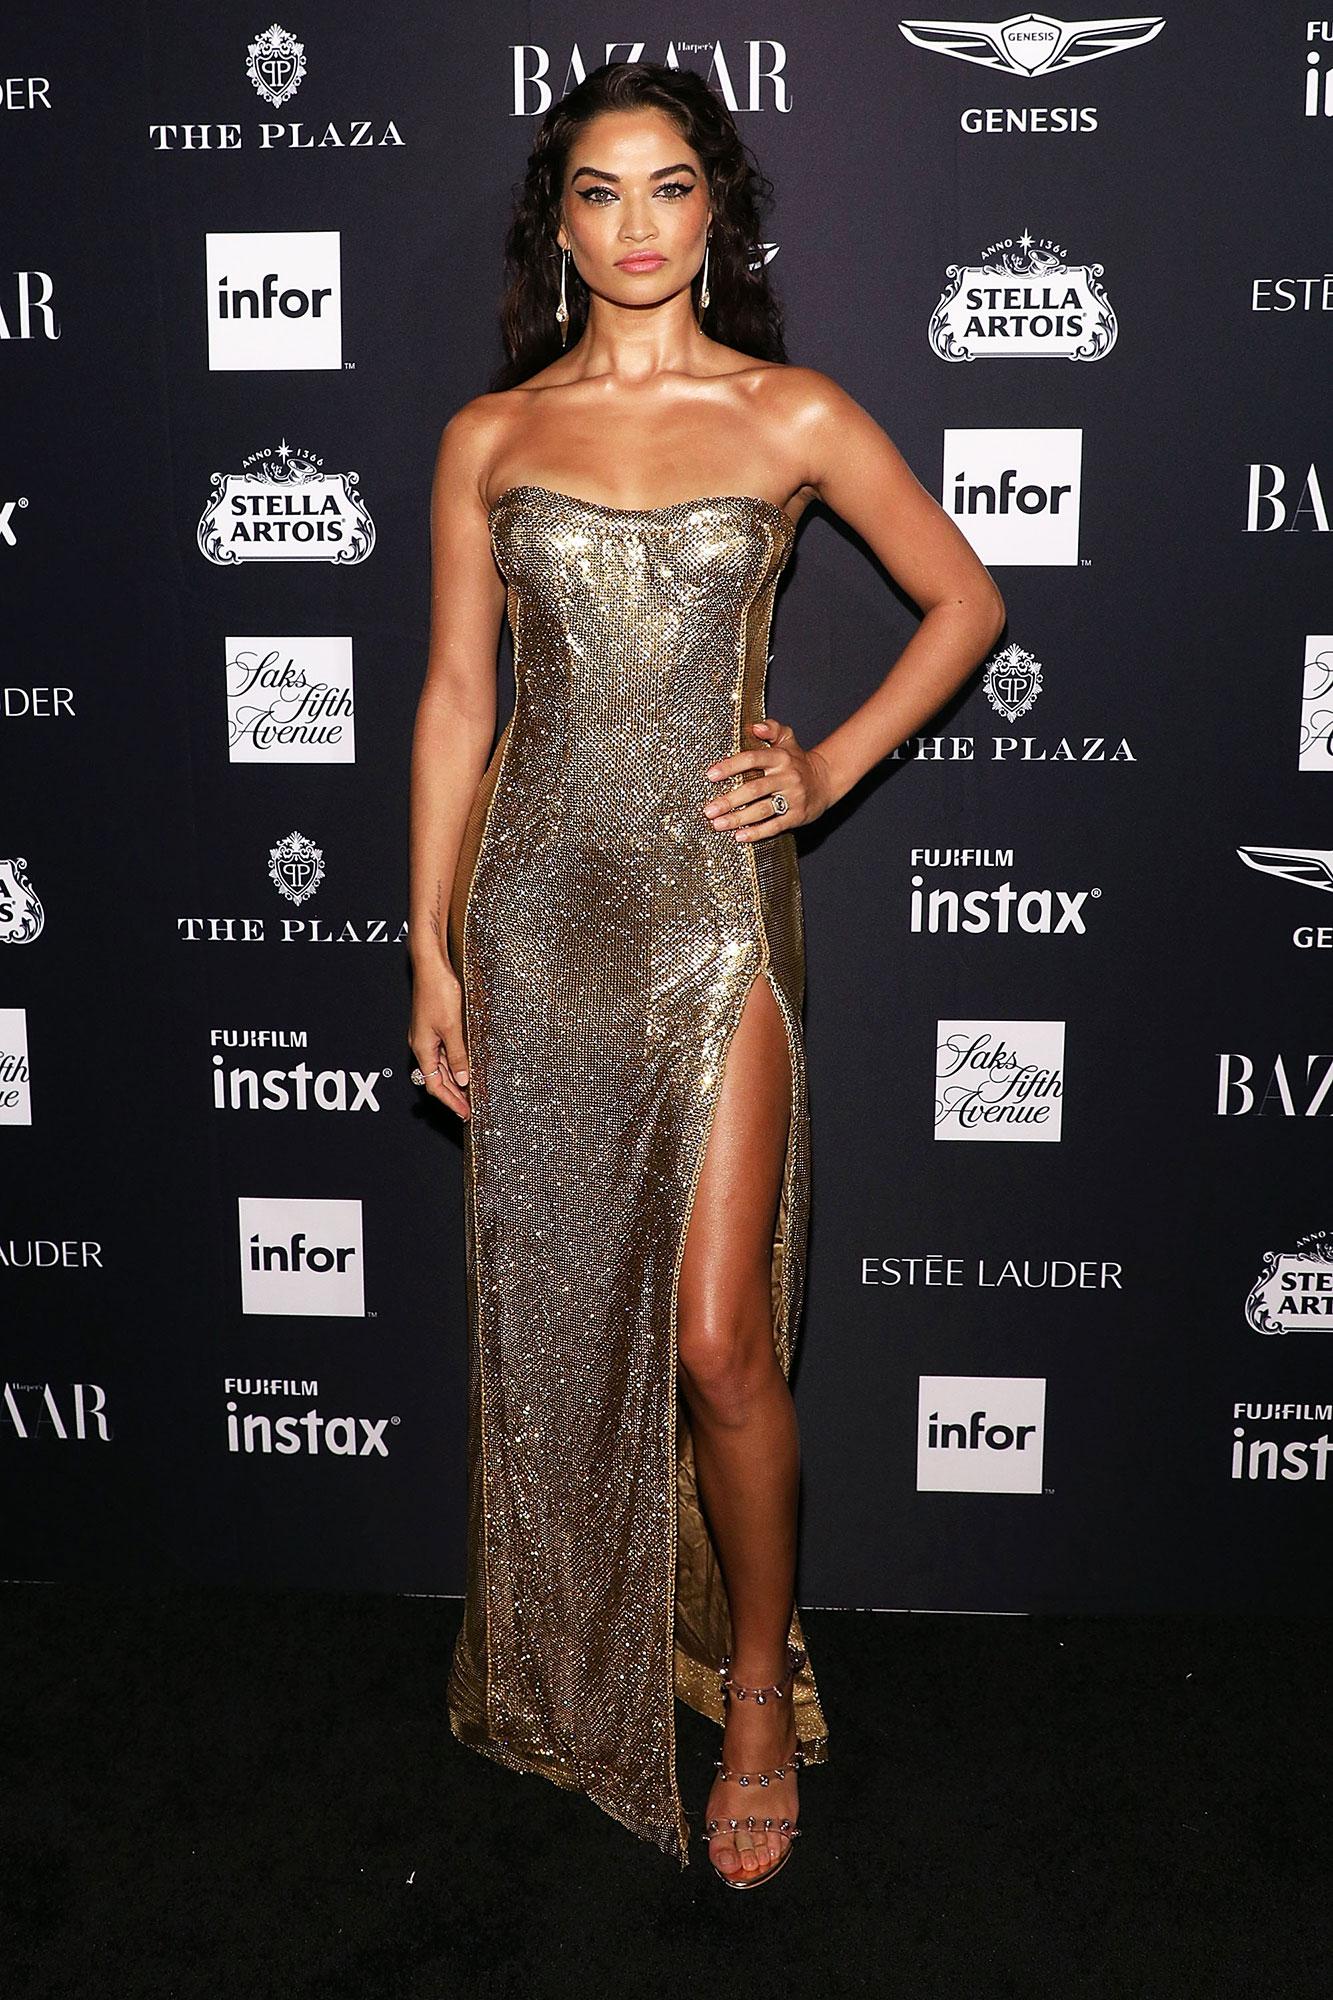 Shanina Shaik stylish gold - In a strapless Pamela Dennis on Sept. 7.